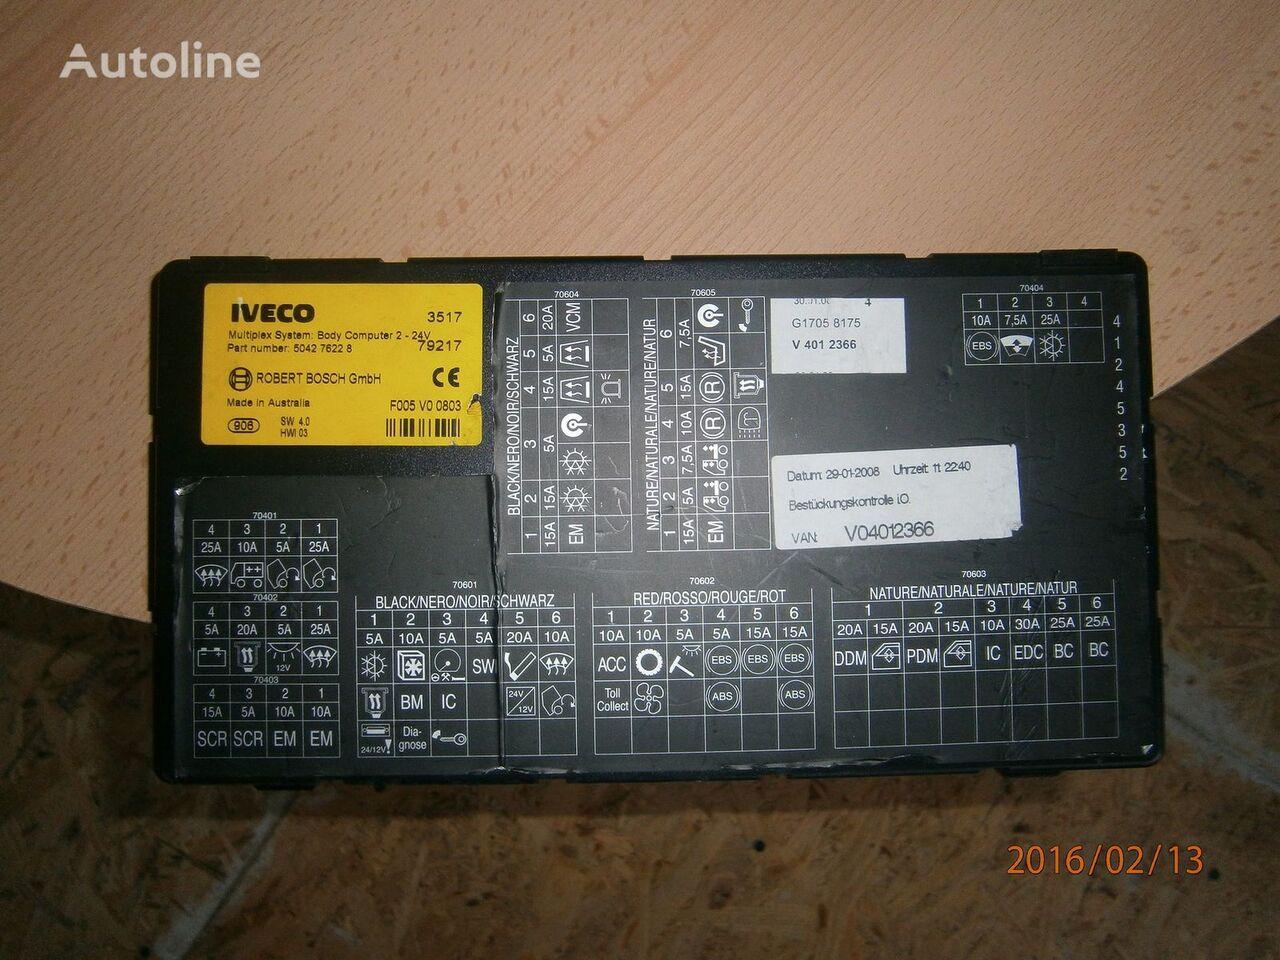 блок управления  Iveco Stralis EURO5 Multiplex system body computer 504276228 для тягача IVECO Stralis